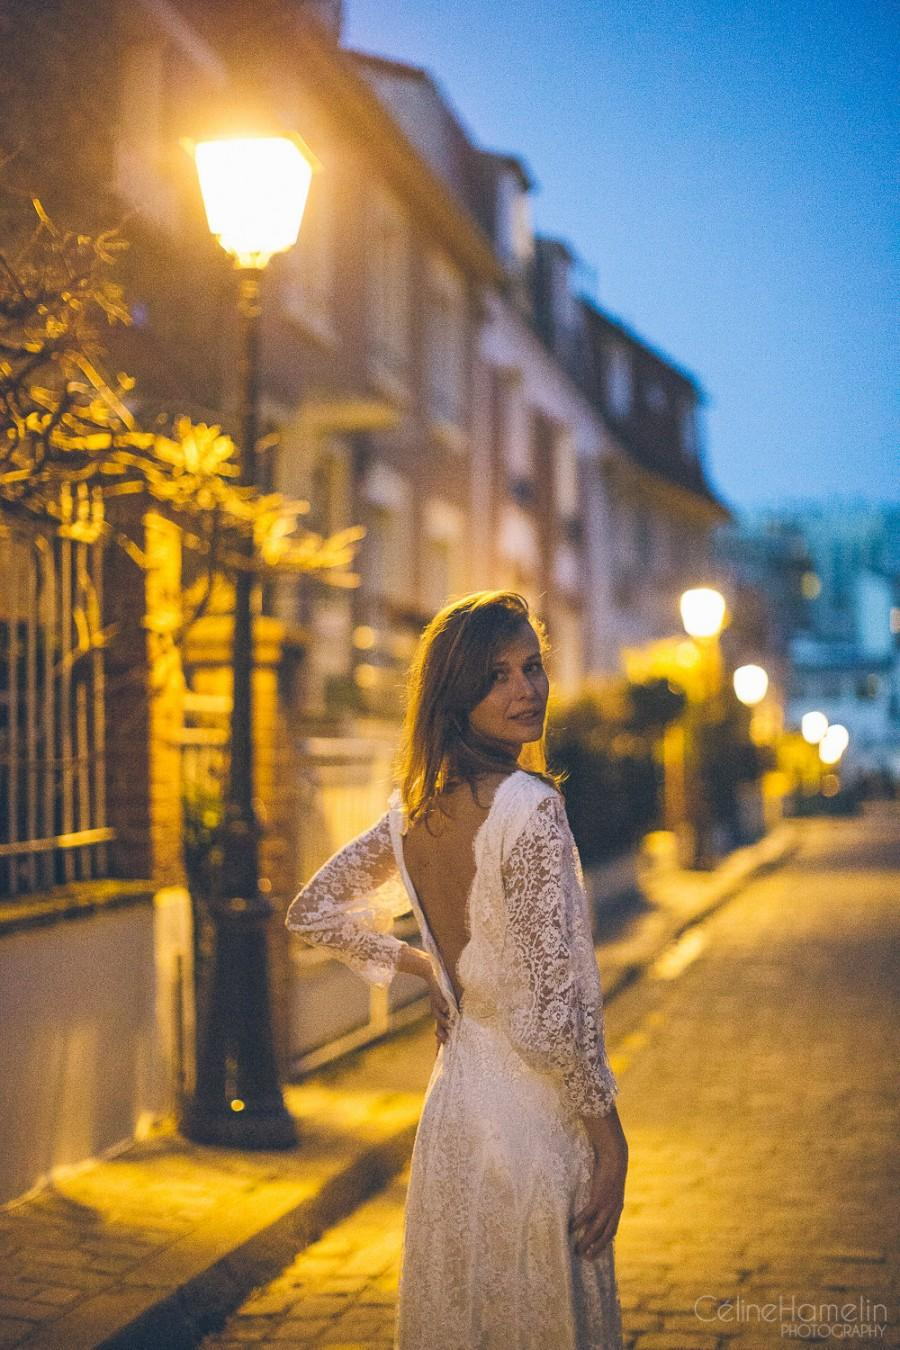 Свадьба - French lace wedding dress single model